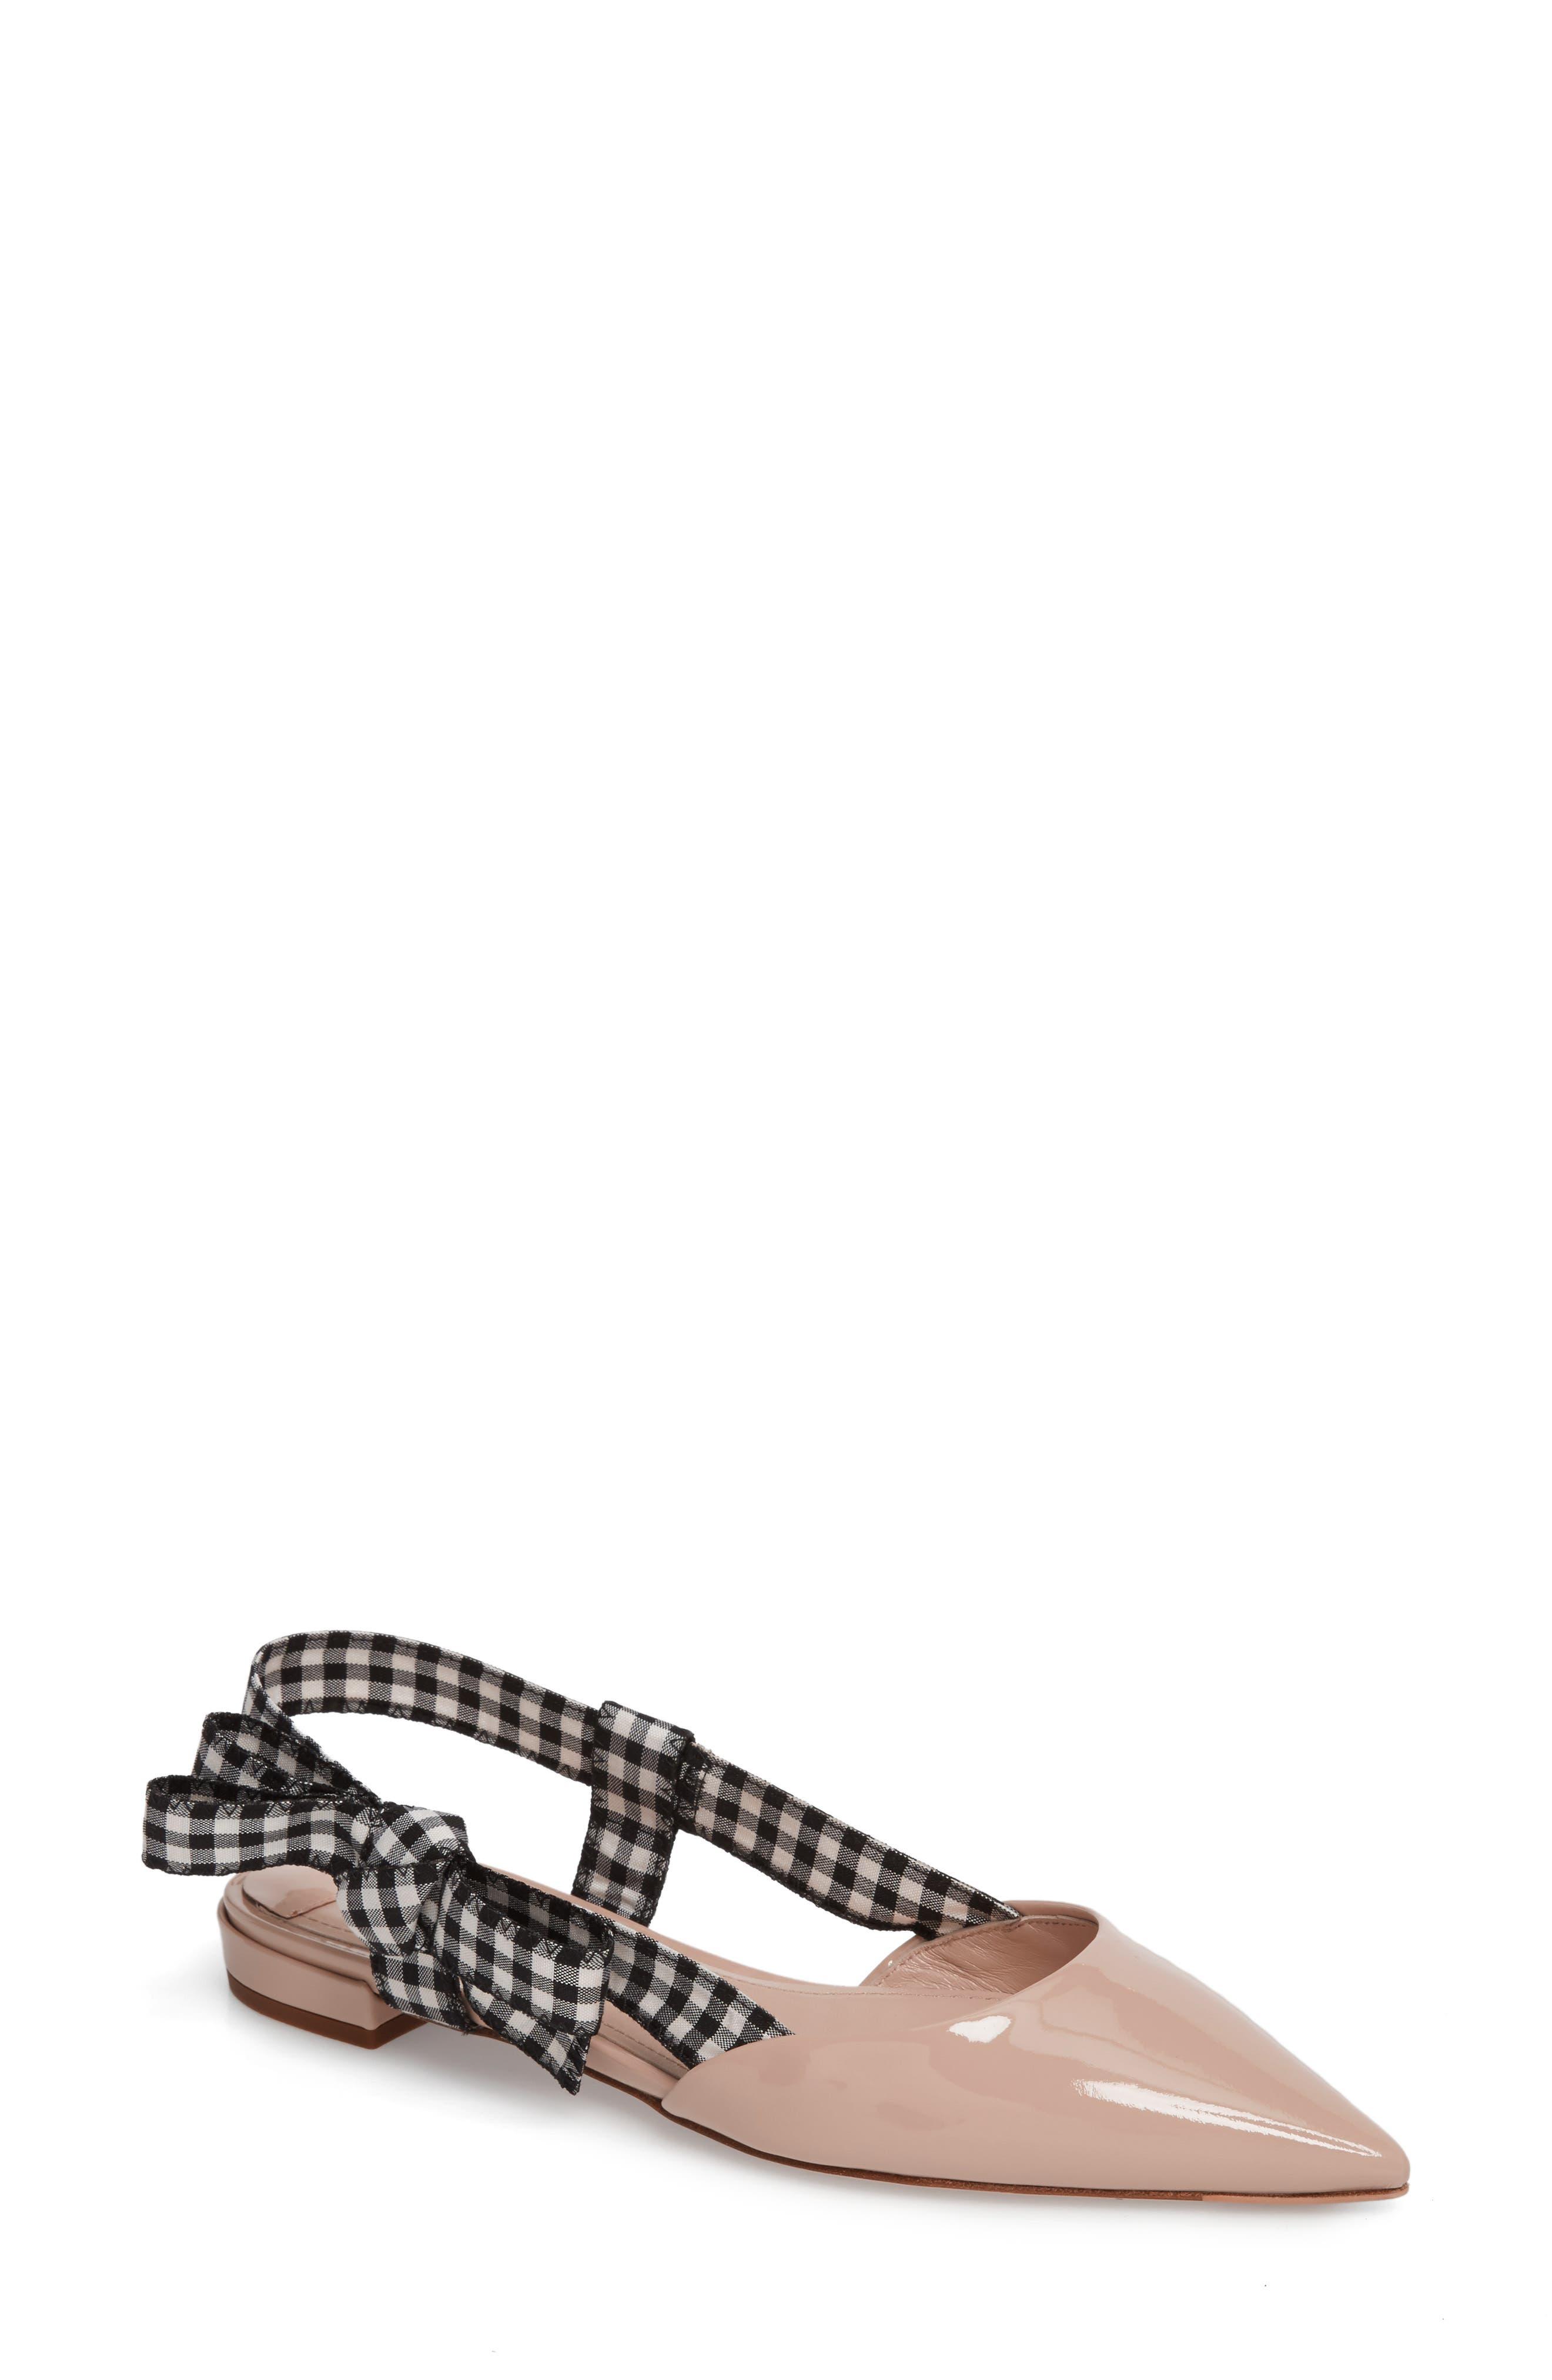 Miu Miu Slingback Bow Pointy Toe Flat (Women)